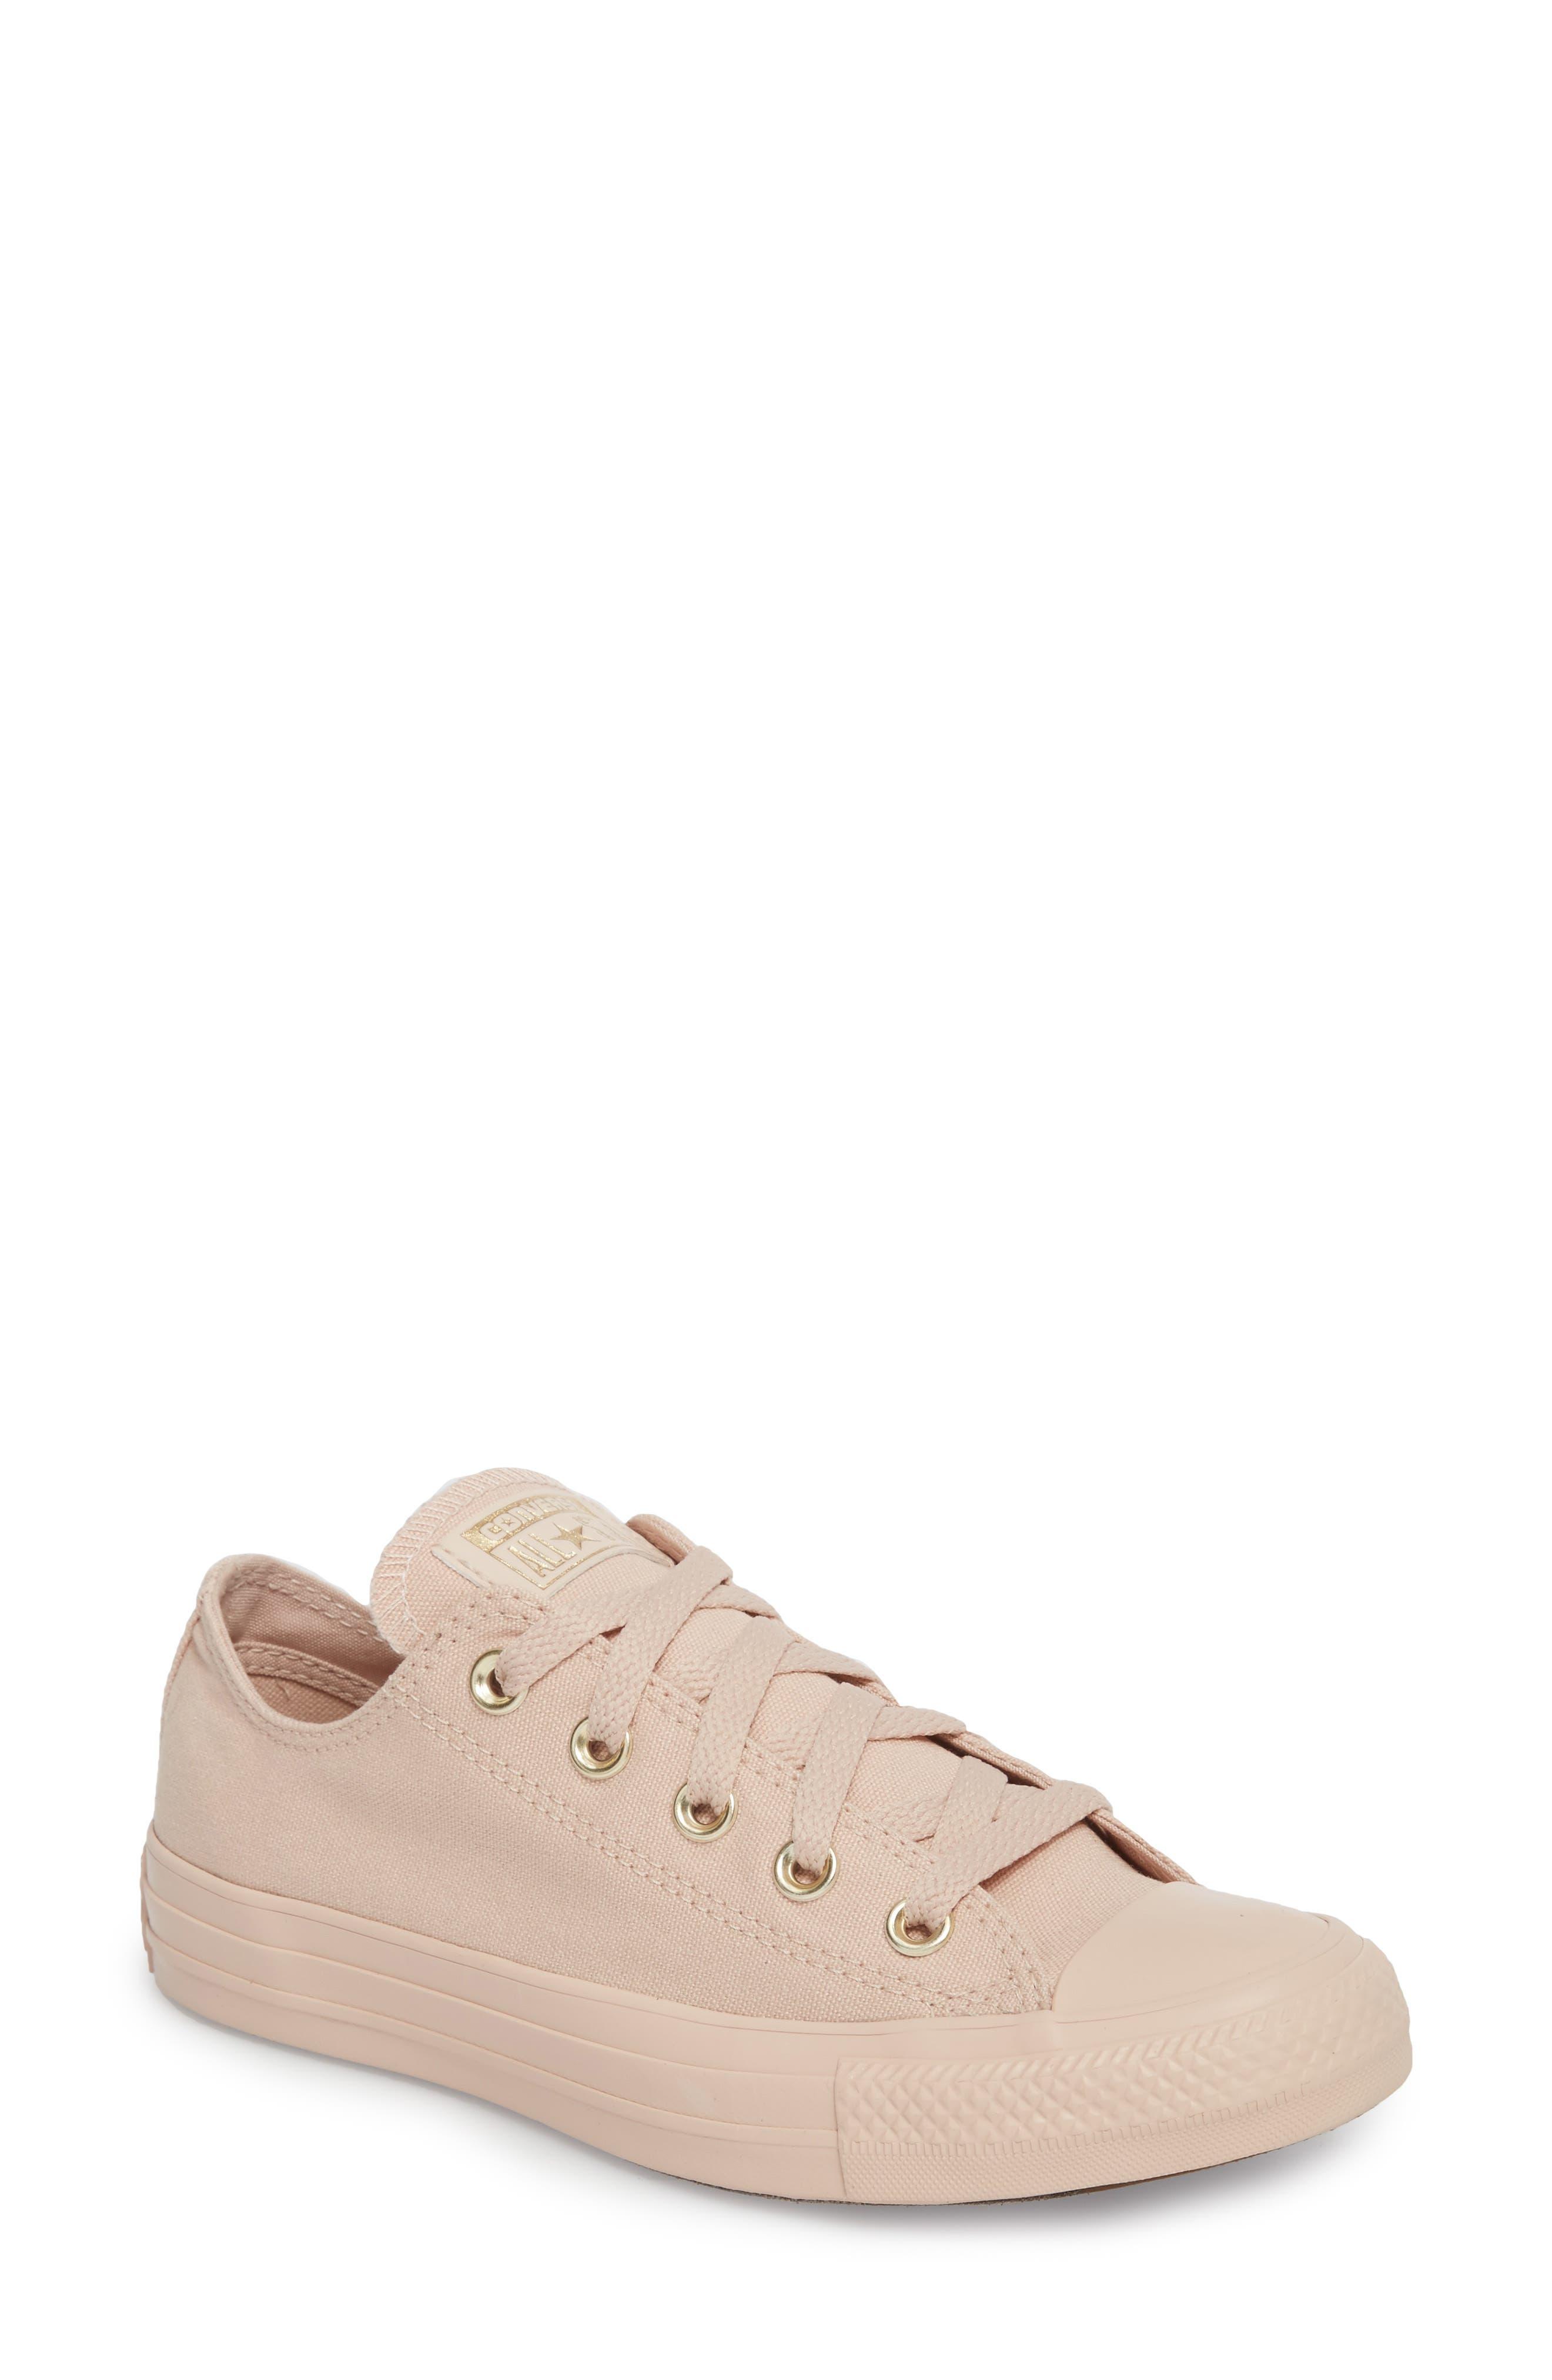 Main Image - Converse Chuck Taylor® All Star® Ox Sneaker (Women)